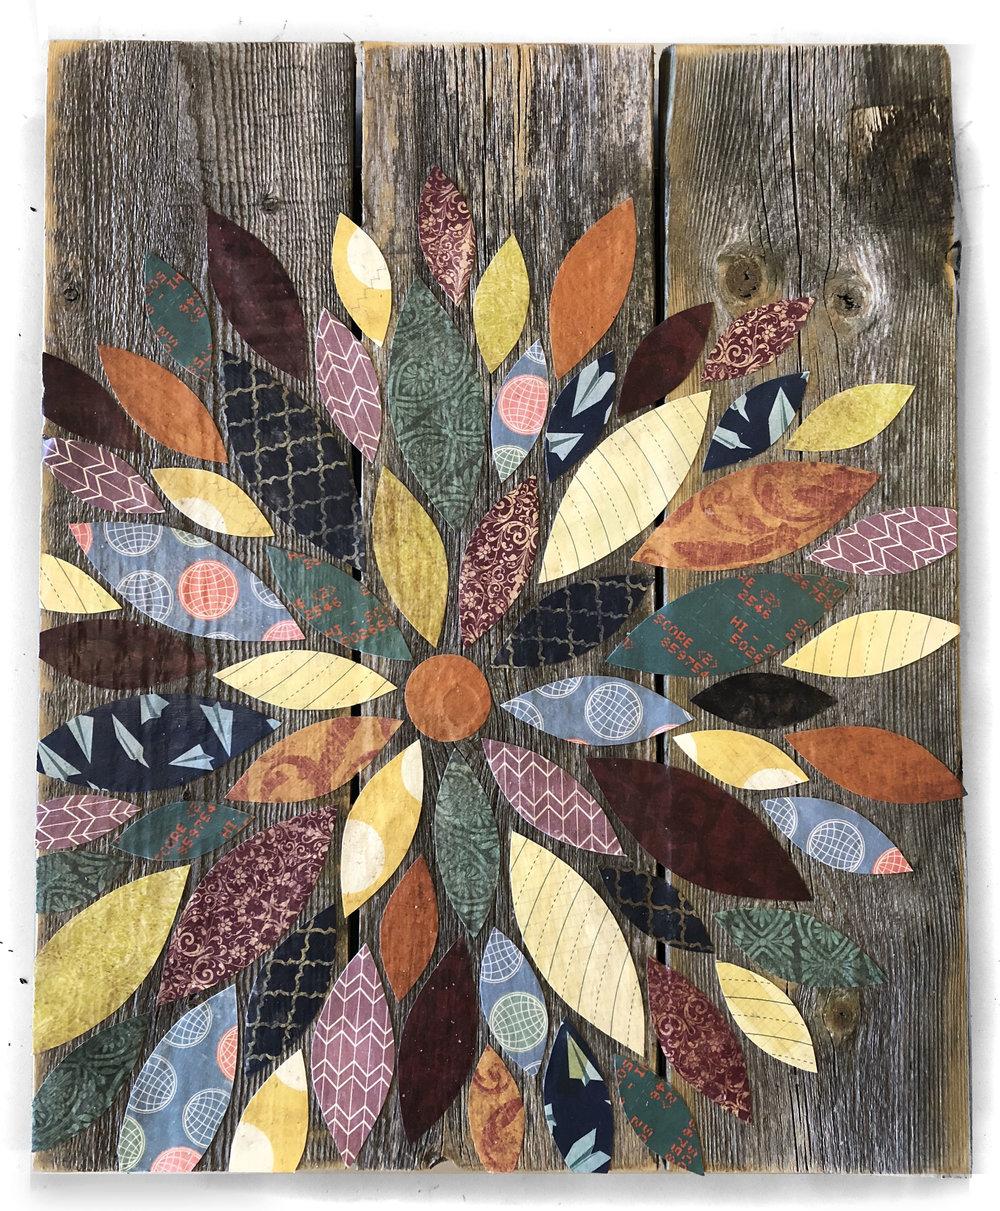 scrapbookflowerwood.jpg